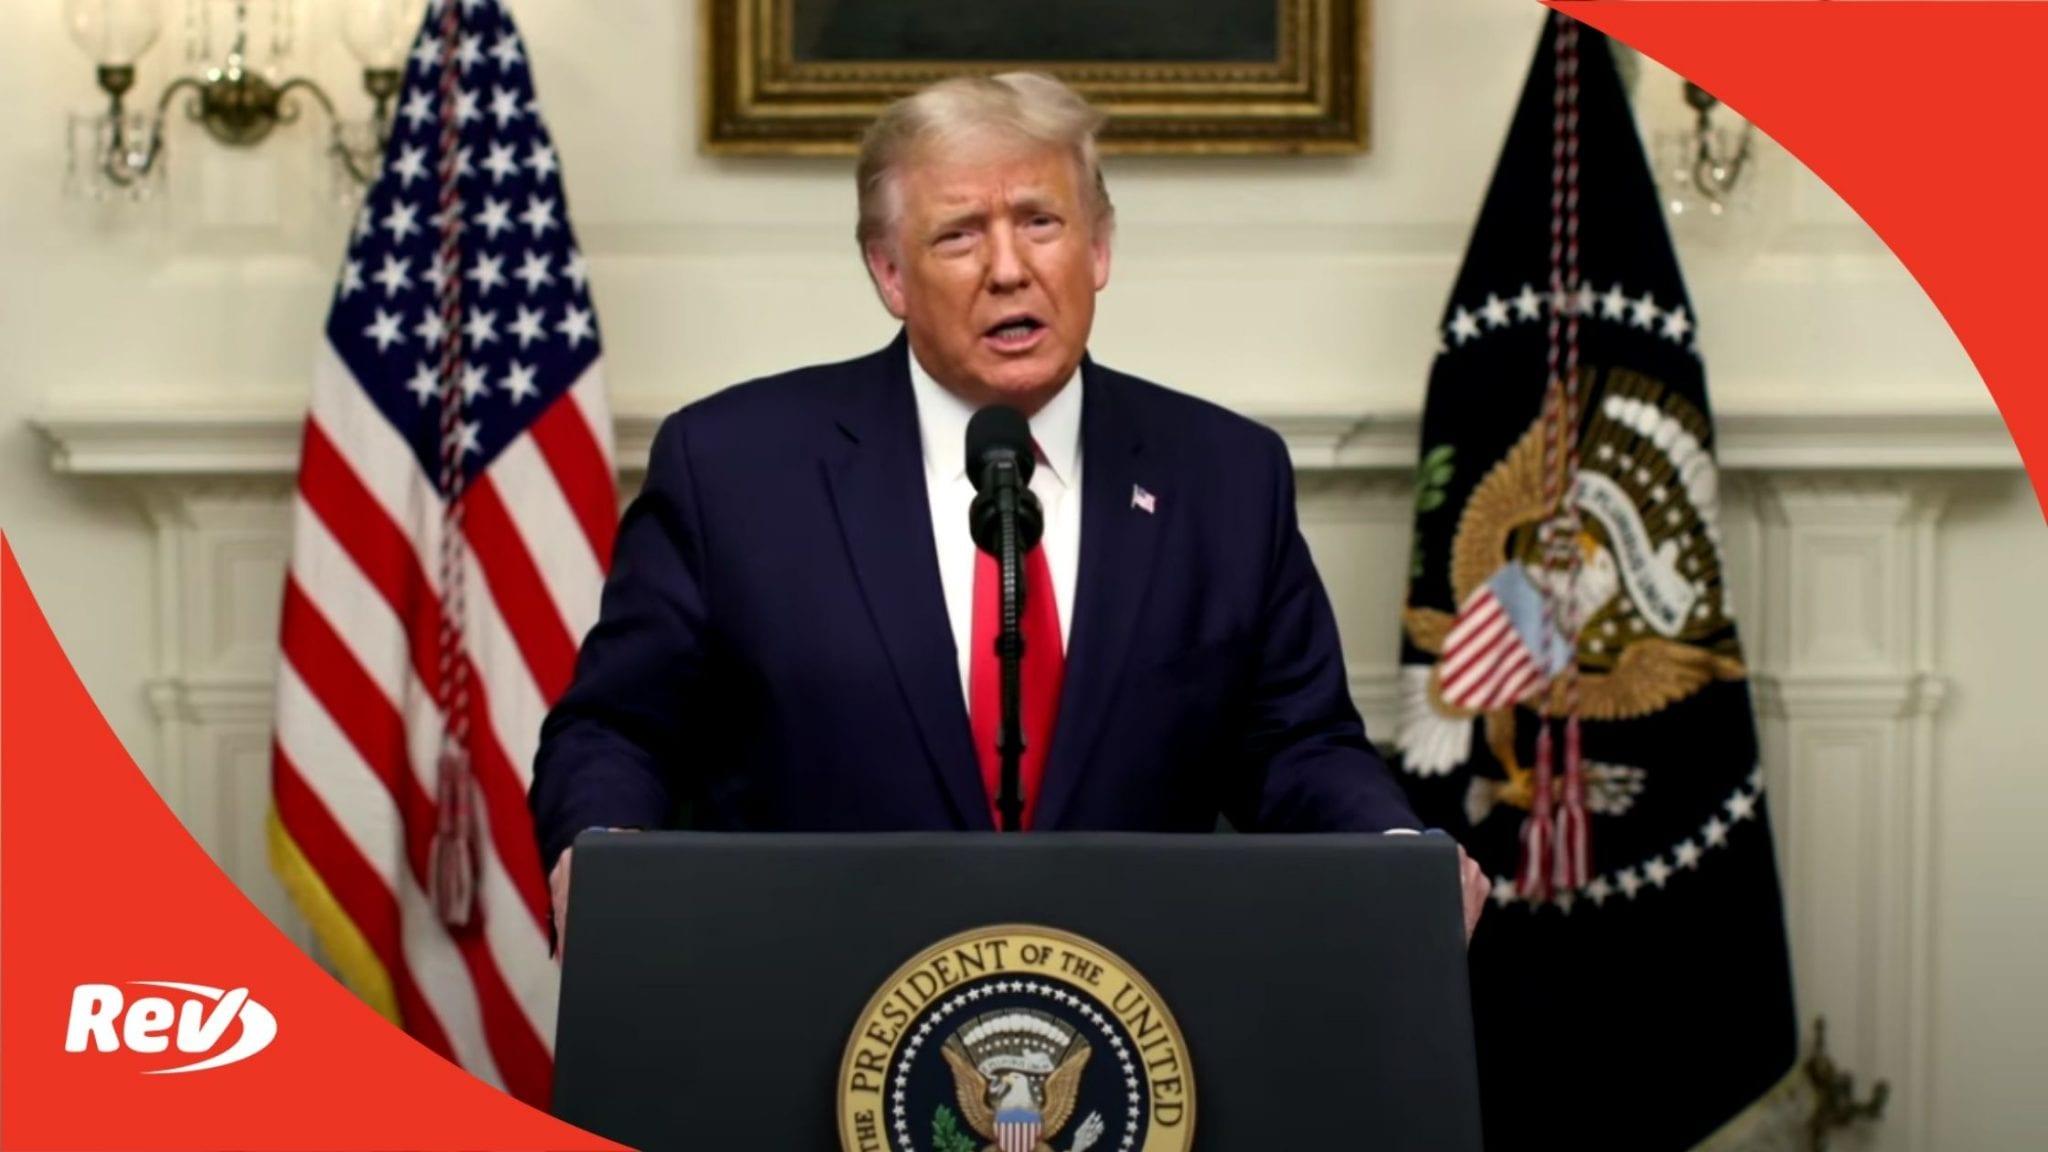 Donald Trump Speech 2020 UN General Assembly Transcript - Rev